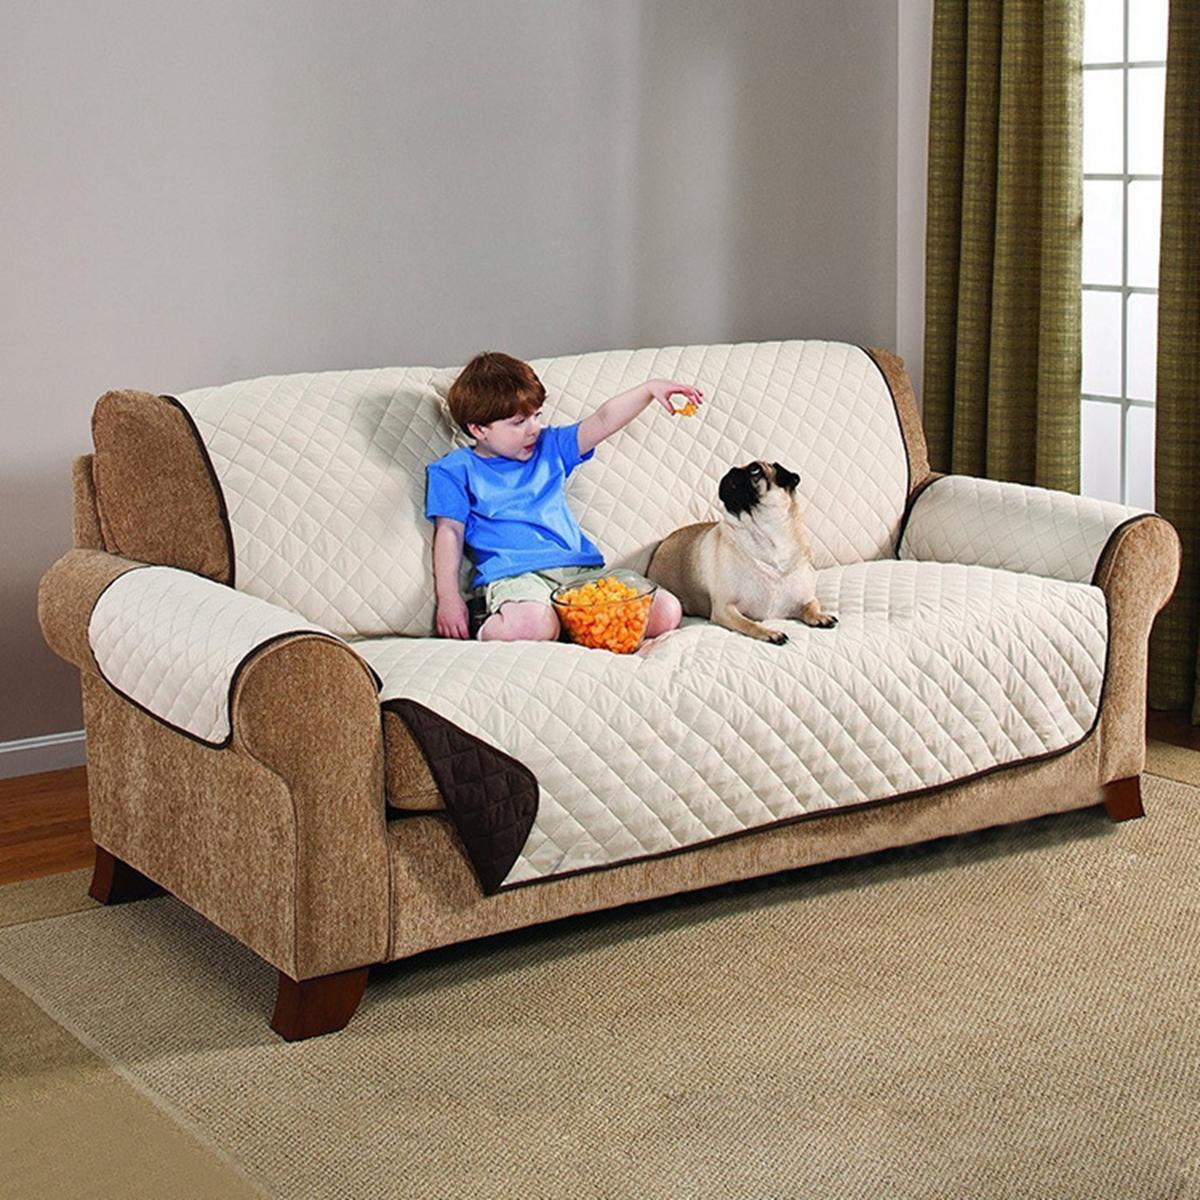 Quilted Waterproof Sofa Slip Cover, Anti Slip Pet